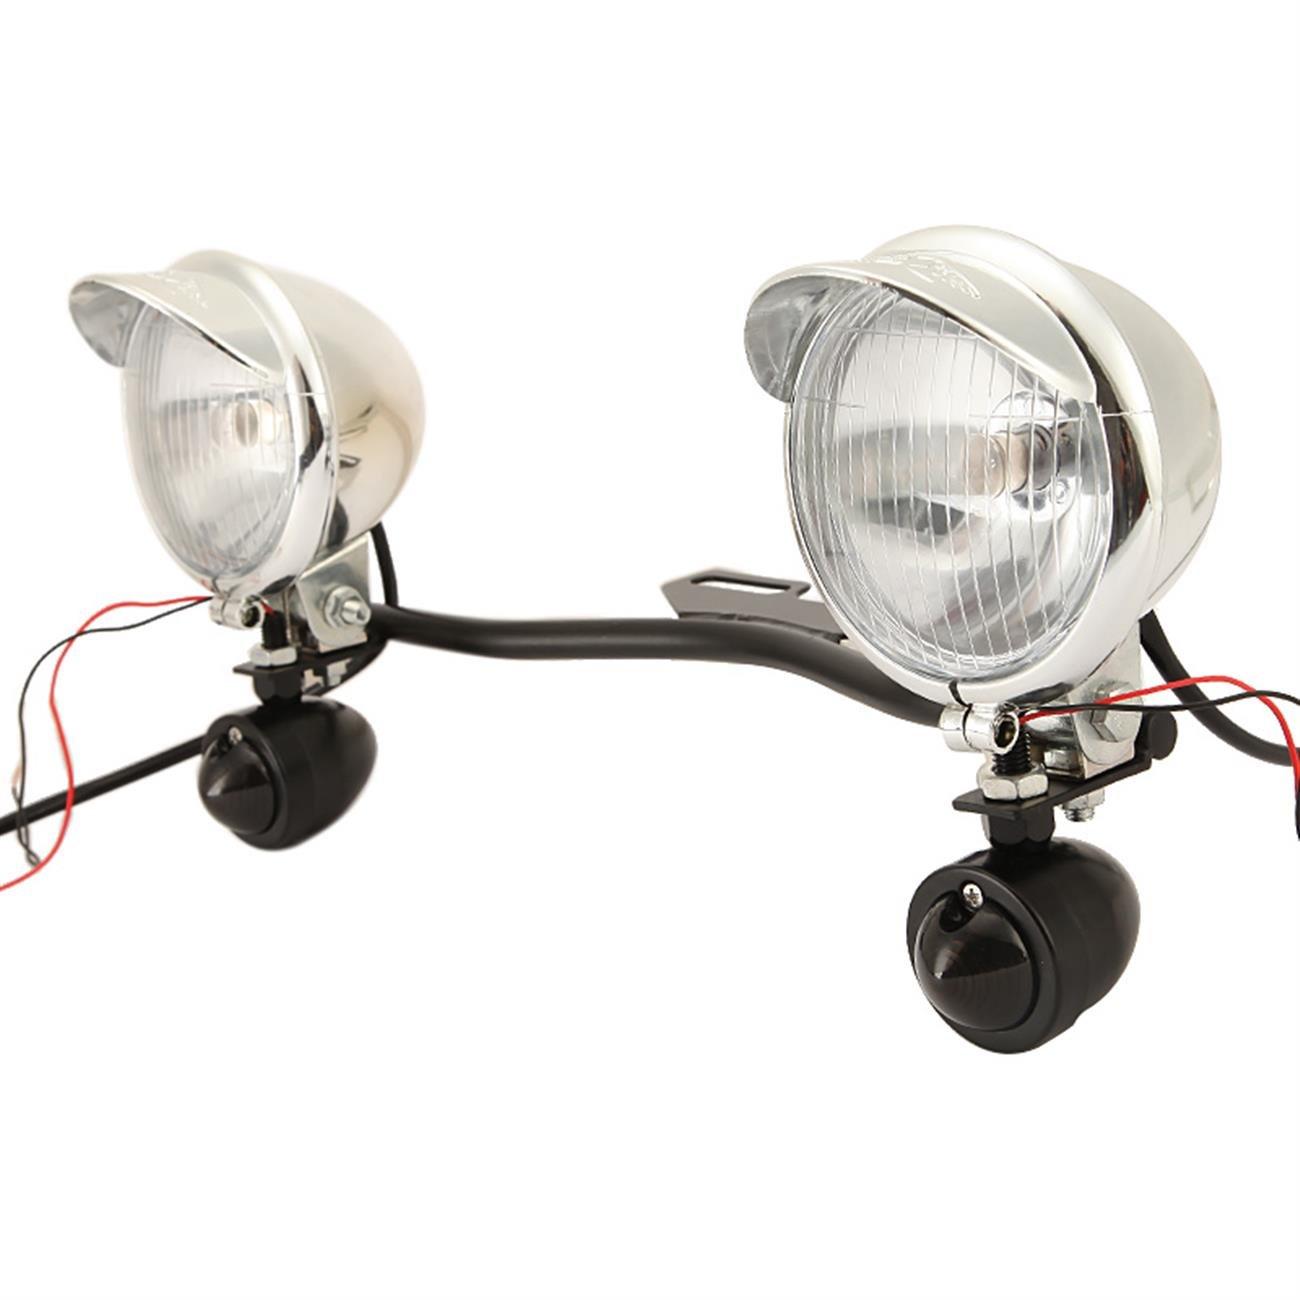 Innoglow Motorcycle Passing Driving Light Bar Kit 1x Steel